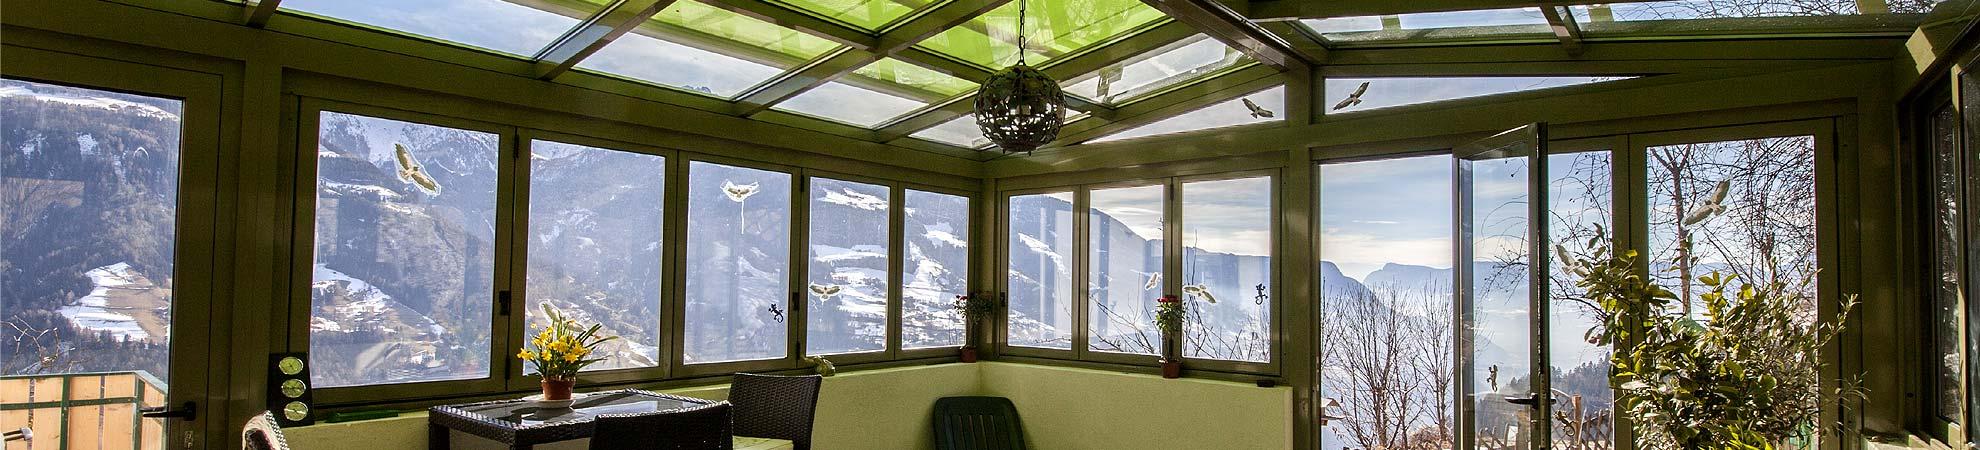 ebiasi-wintergarten-kalt-total-1